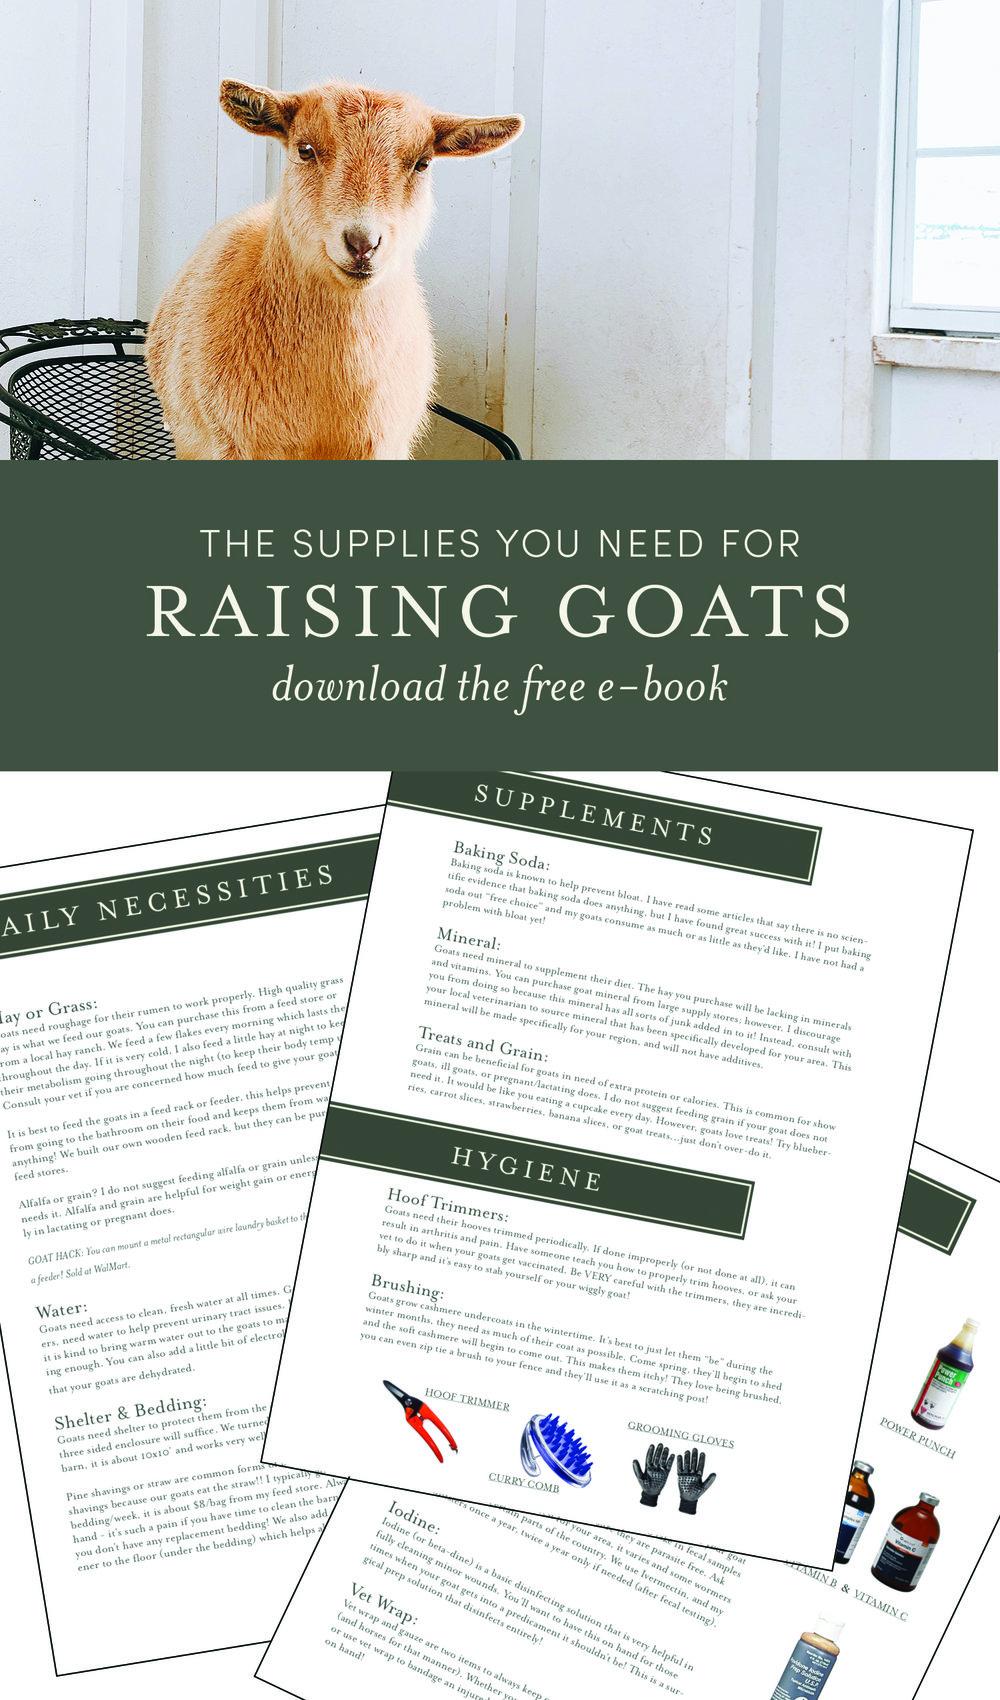 Raising Goats - helpful supplies for raising goats! A free e-book for raising goats! boxwoodavenue.com #homesteading #raisinggoats